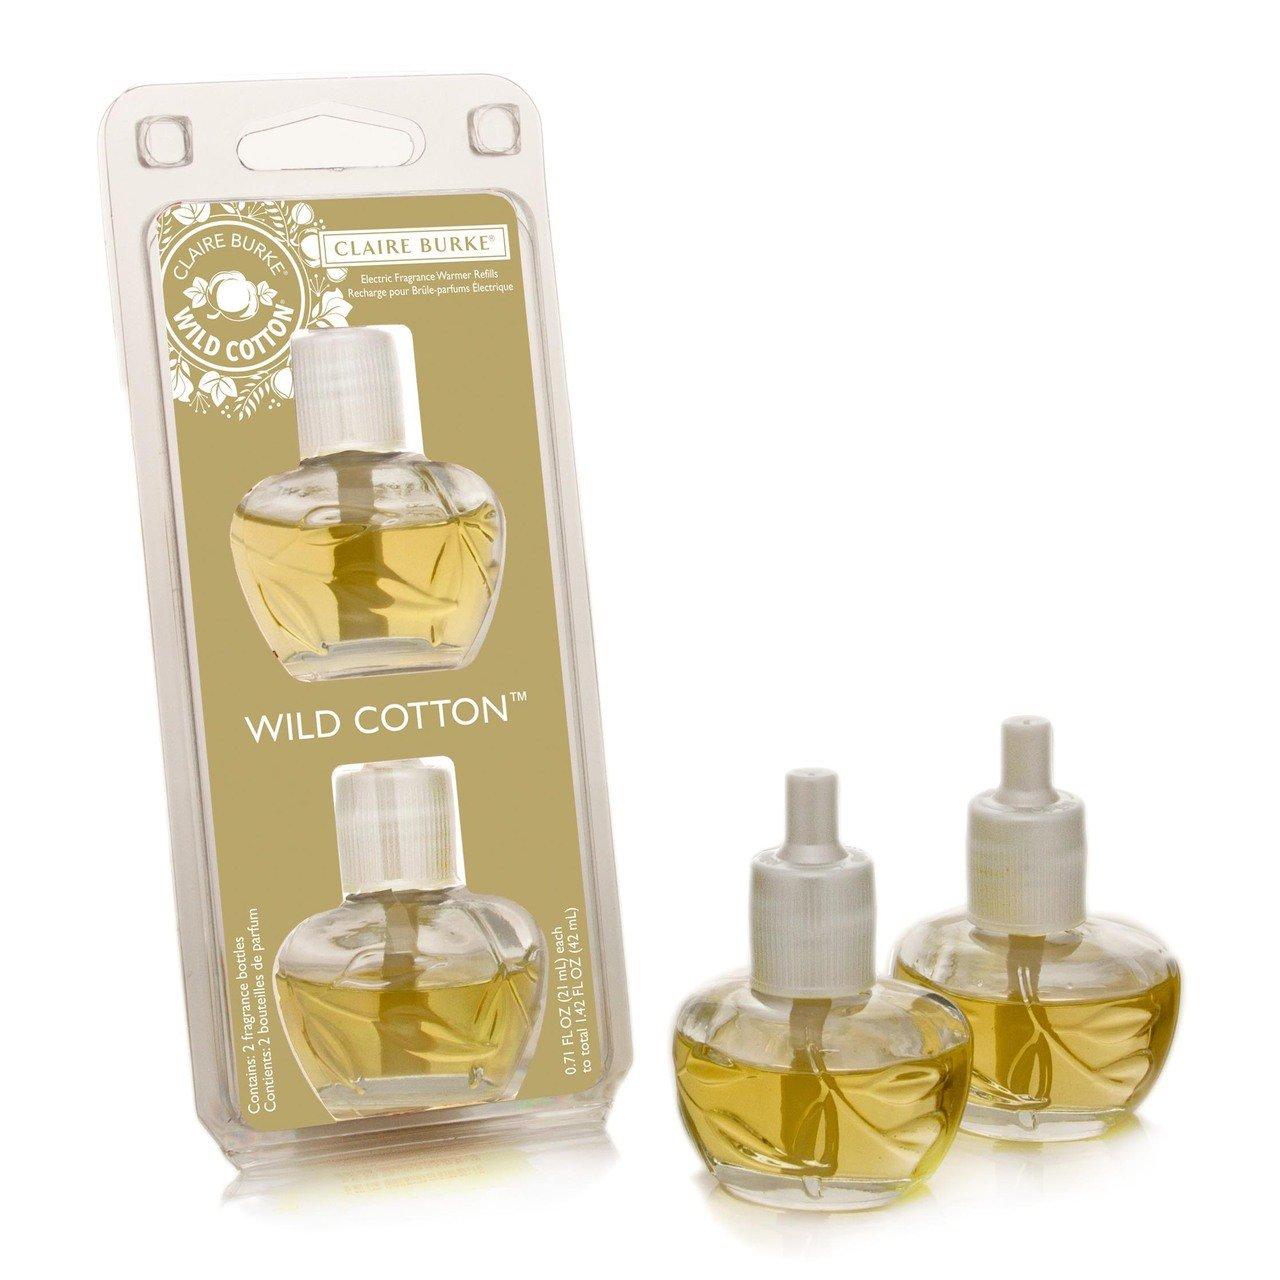 Claire Burke Wild Cotton Fragrance